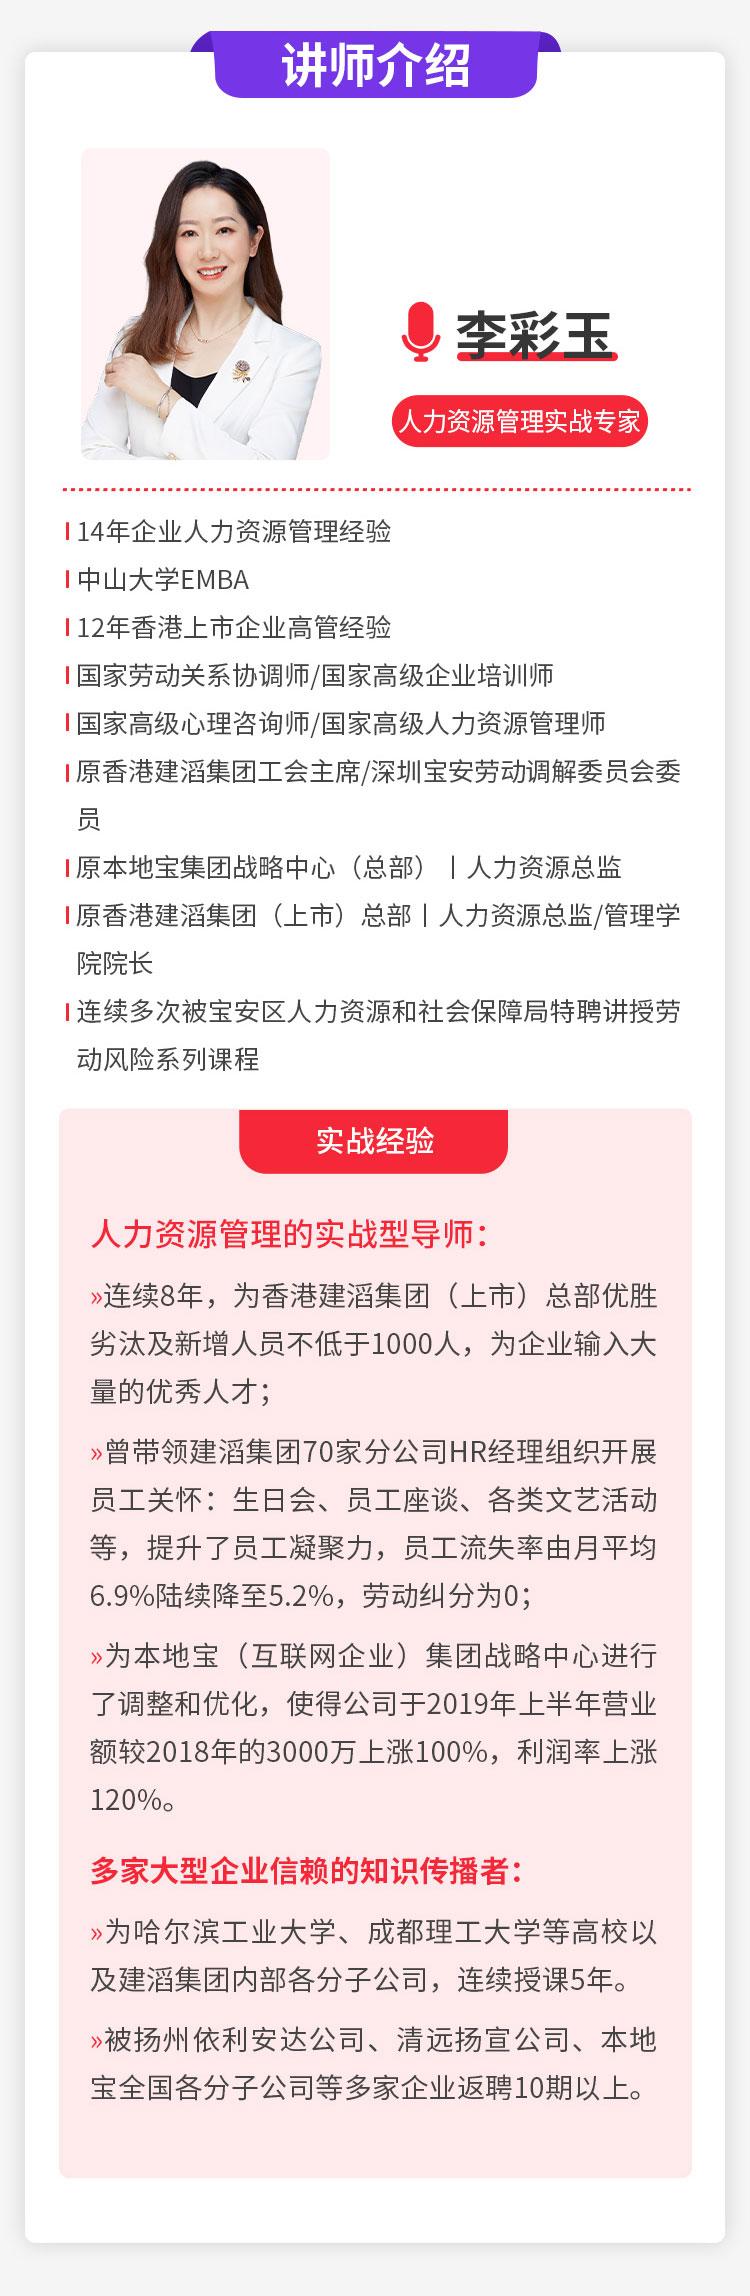 https://hs-1251609649.cos.ap-guangzhou.myqcloud.com/newhdp%2Flive_cover%2F4667%2F5bda0b912adfa8aa8d647aa8fff7f8f6.jpeg